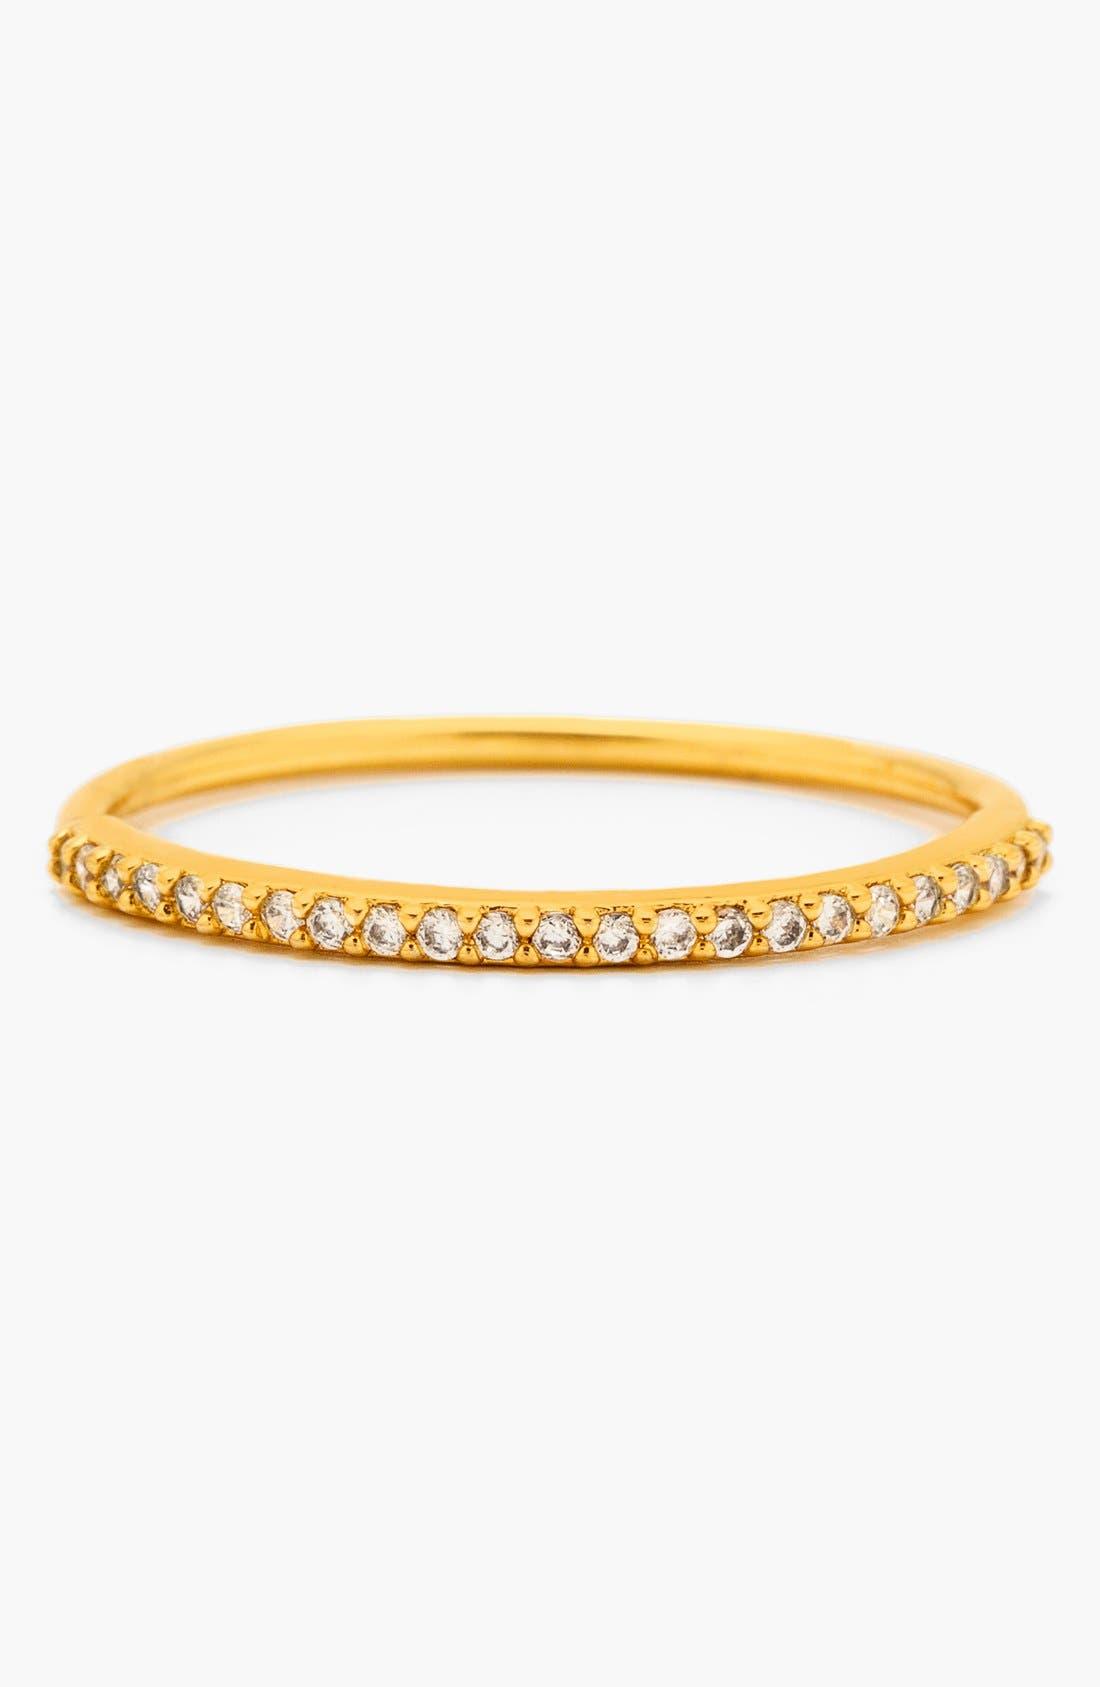 Main Image - gorjana 'Shimmer' Band Ring